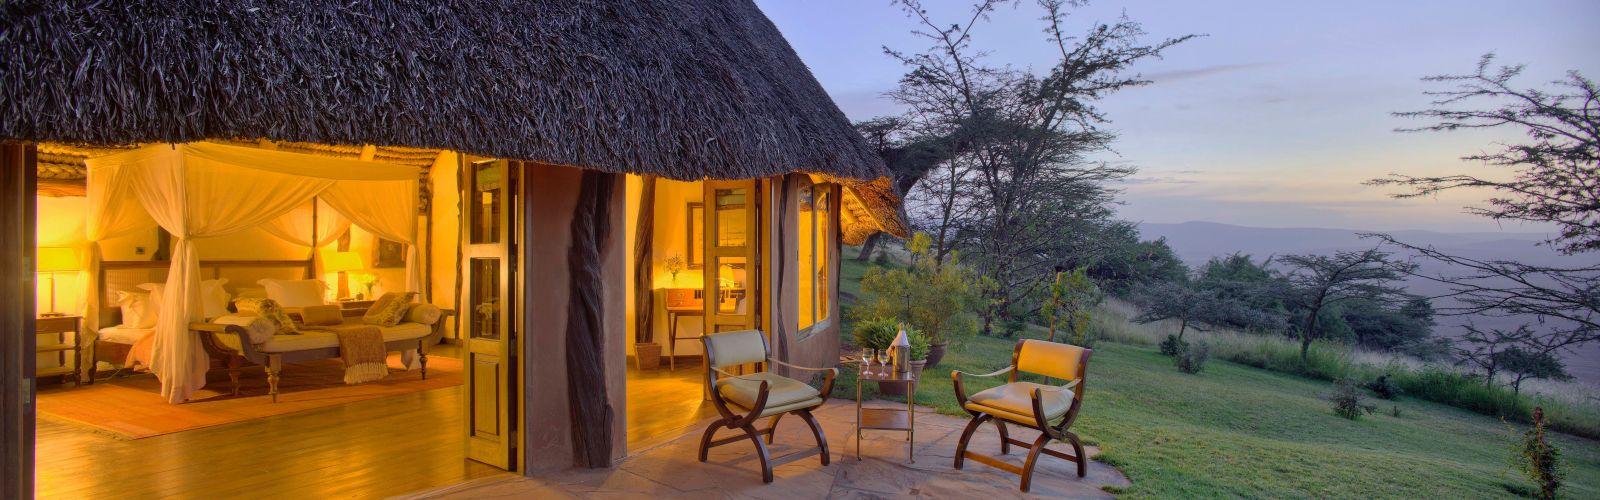 Safari\'s in Afrika